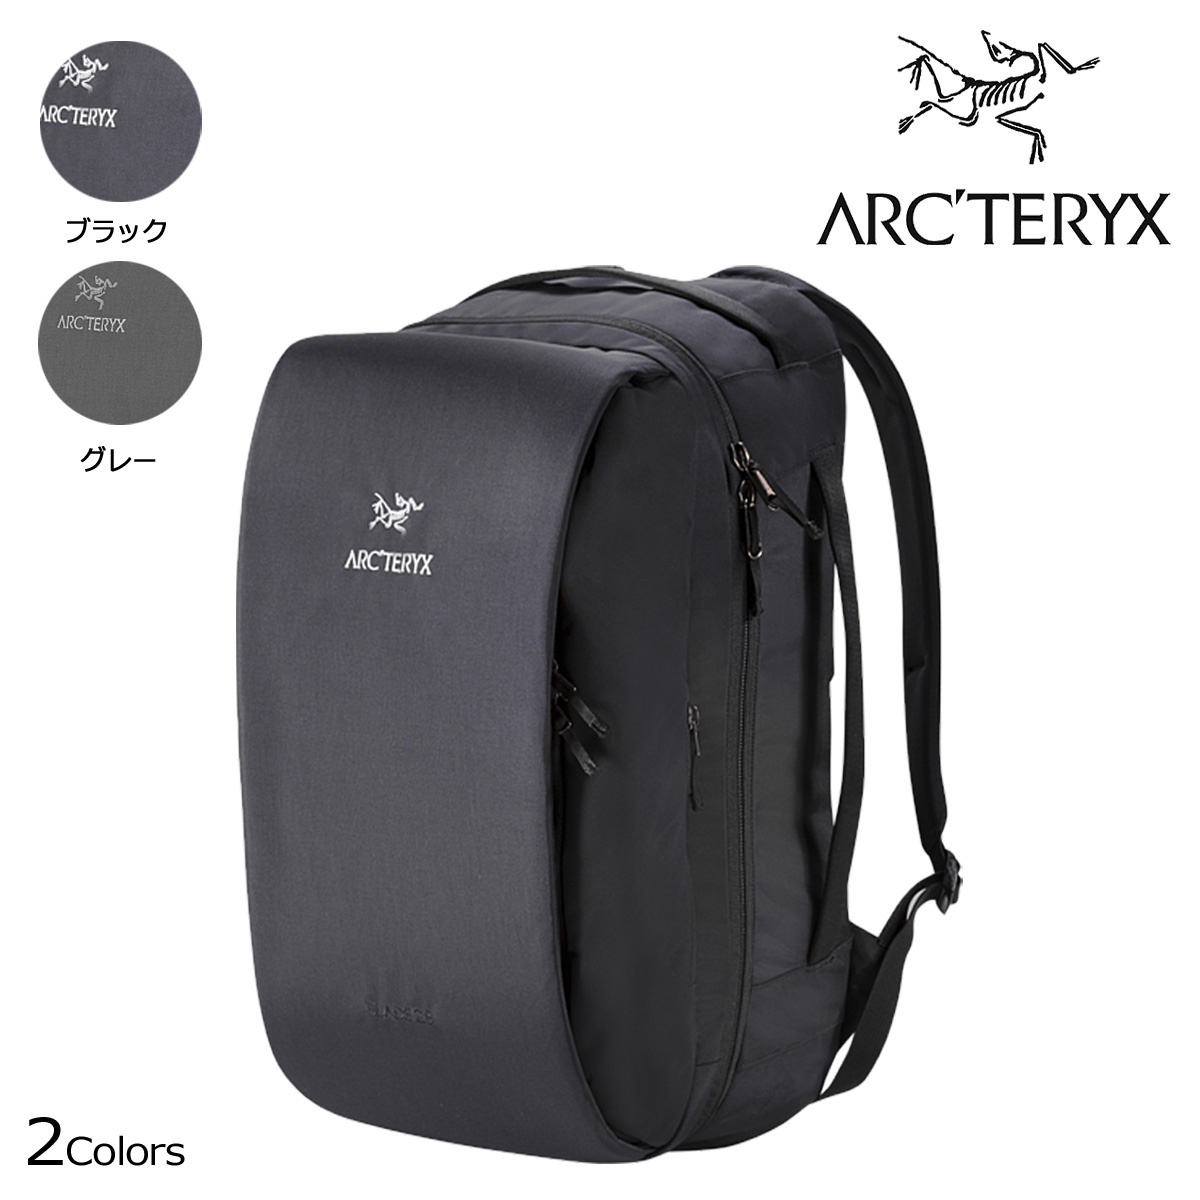 ARC'TERYX BLADE 28 BACKPACK アークテリクス リュック バックパック ブレード28 28L メンズ ブラック グレー [192]